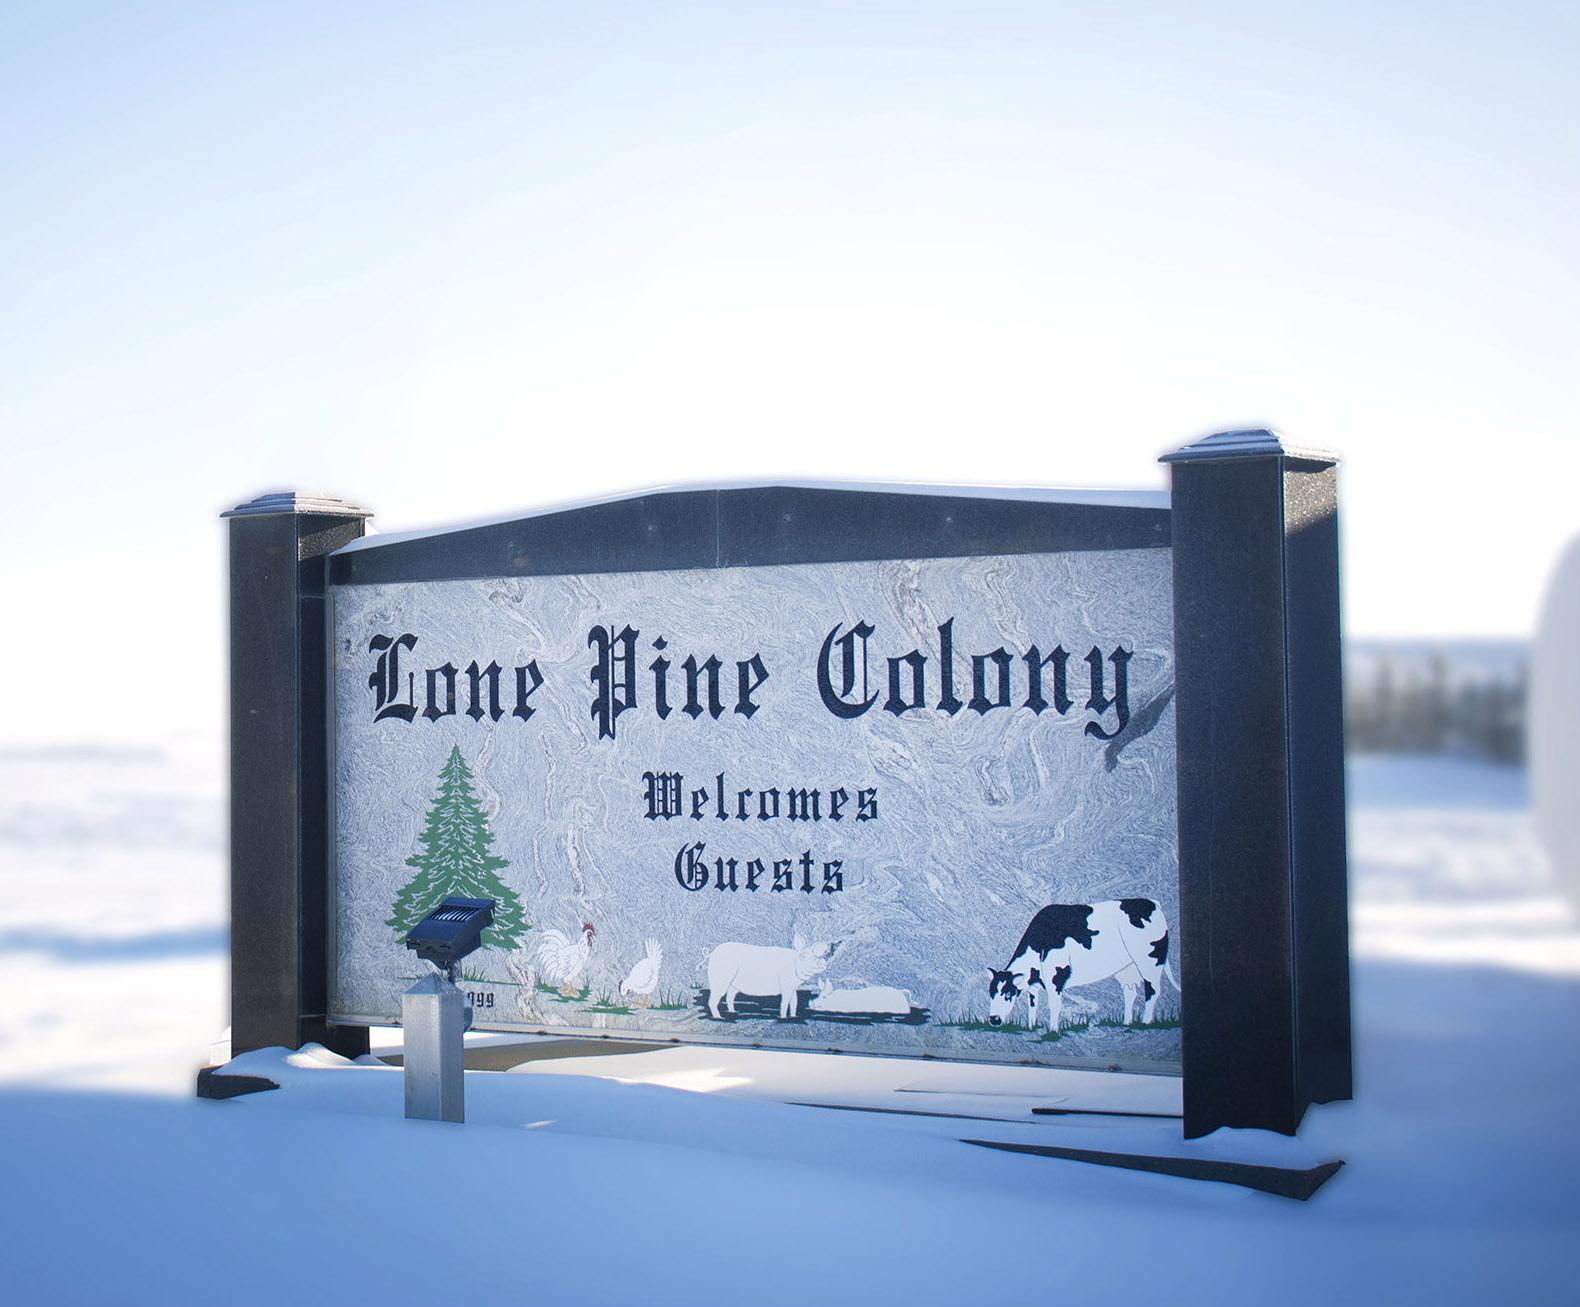 Lone Pine Colony